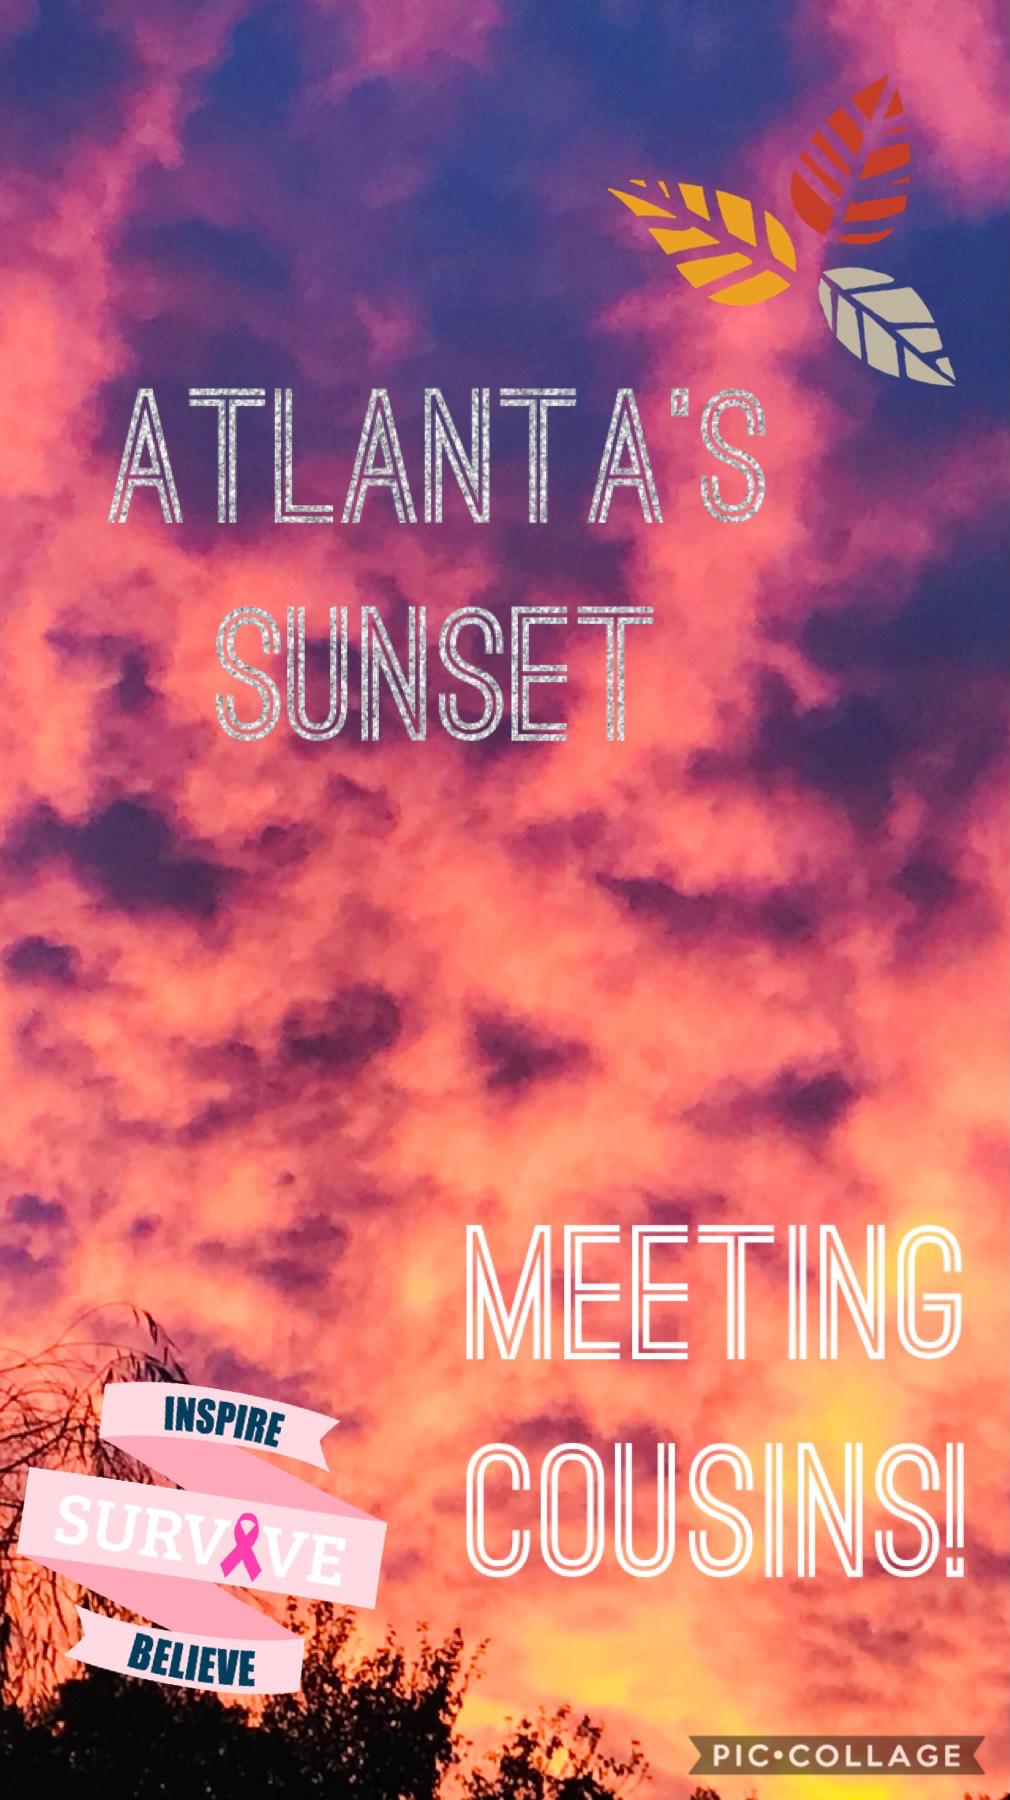 Atlanta's sunset!!